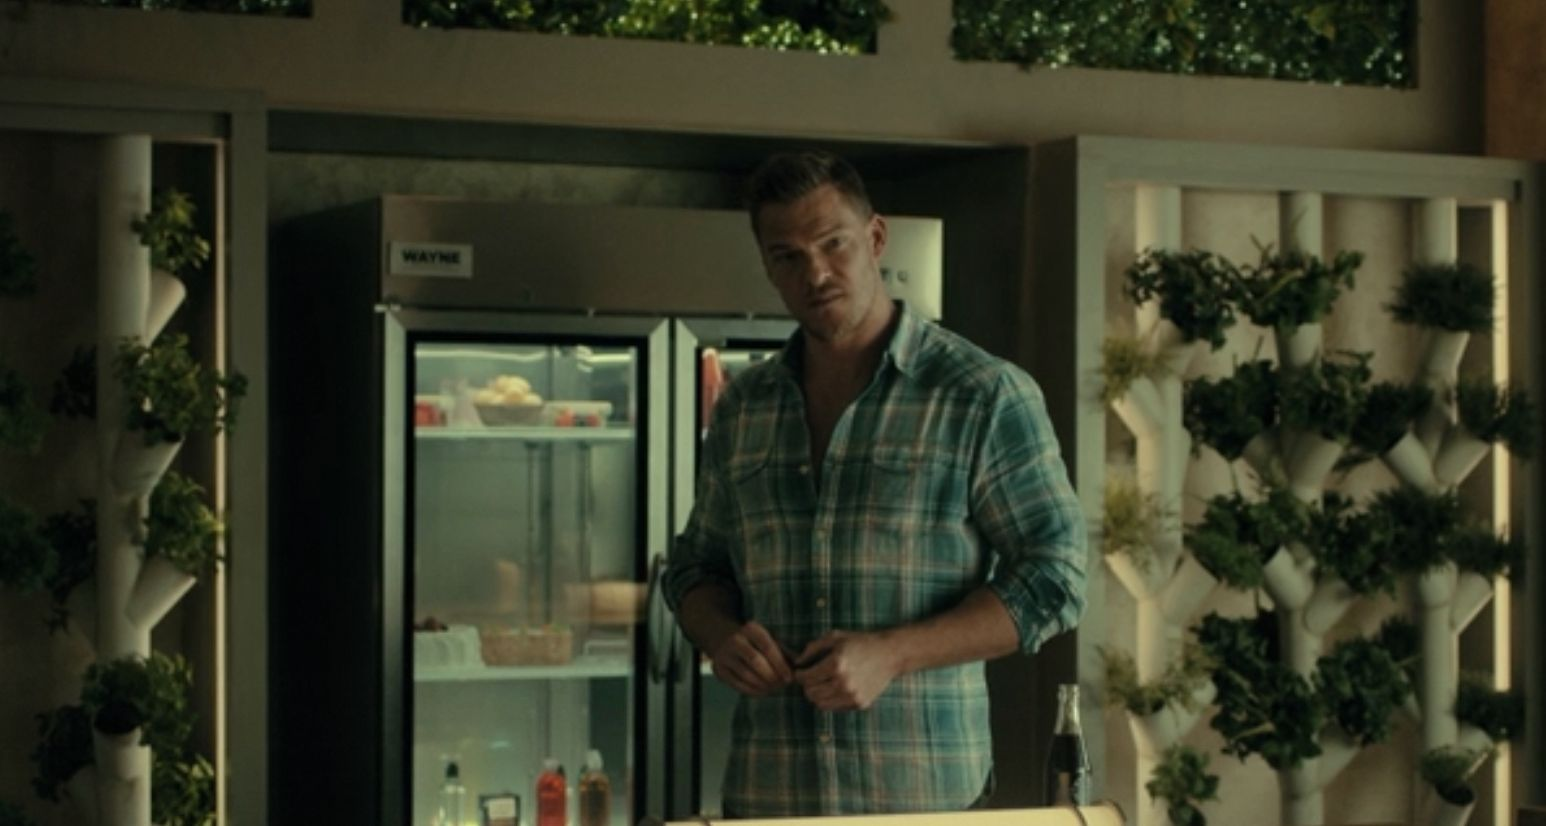 Hank Hall aka Hawk played by Alan Ritchson in Titans Season 3 Episode 3